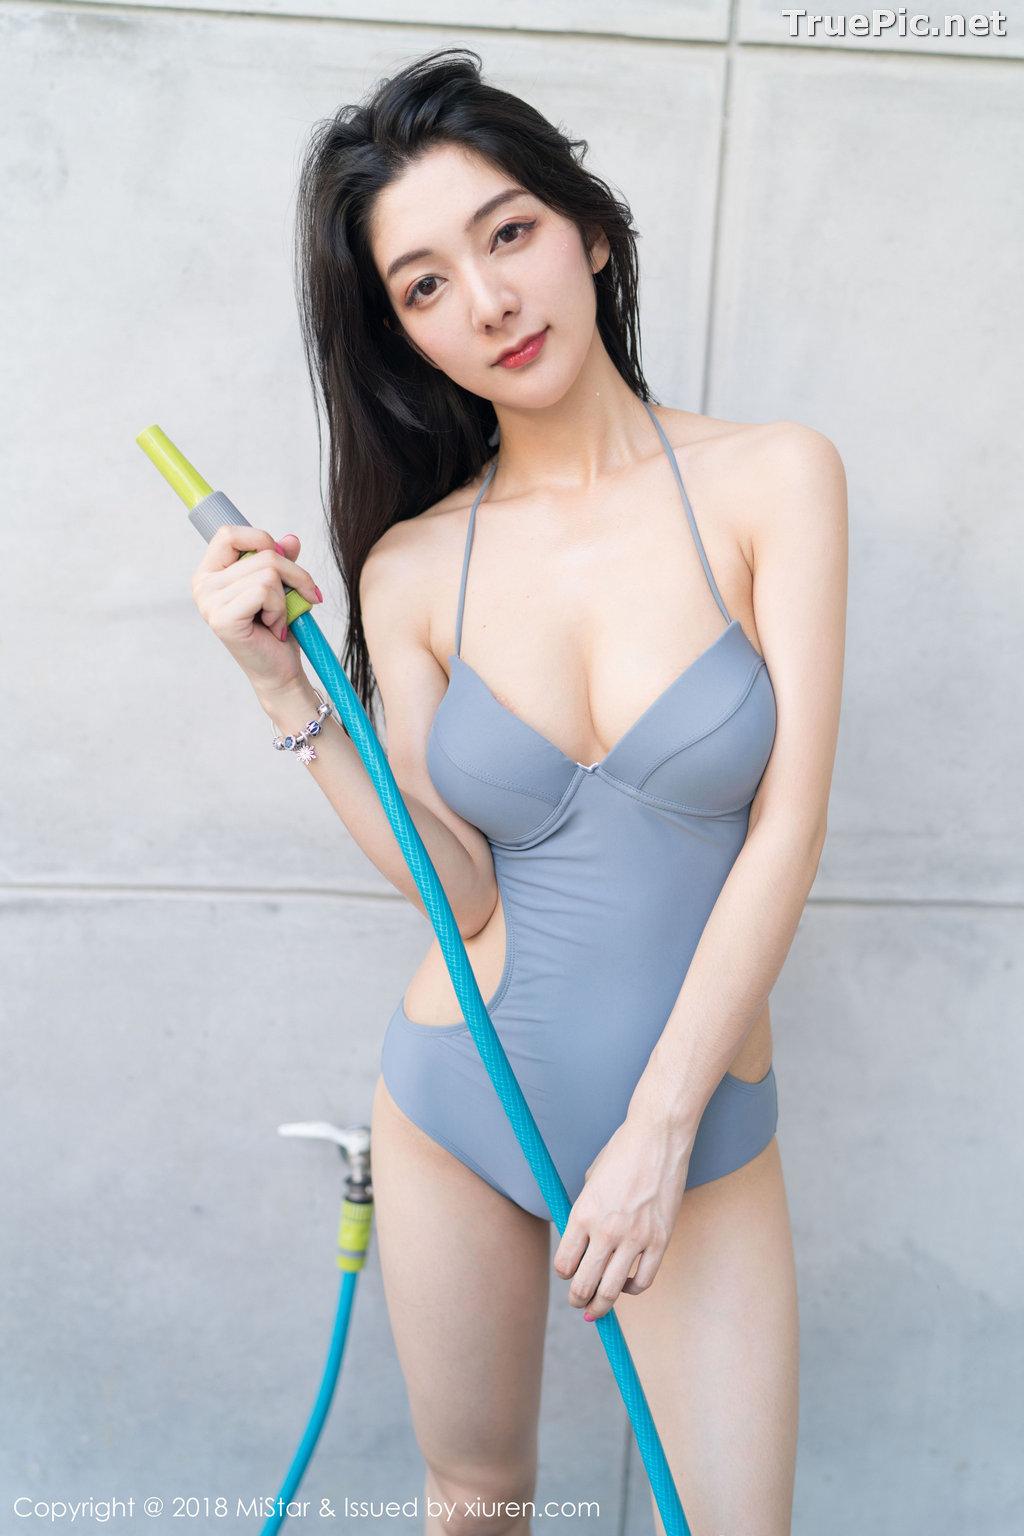 Image MiStar Vol.238 - Chinese Model - Xiao Reba (Angela小热巴) - Sleep Dress and Monokini - TruePic.net - Picture-35